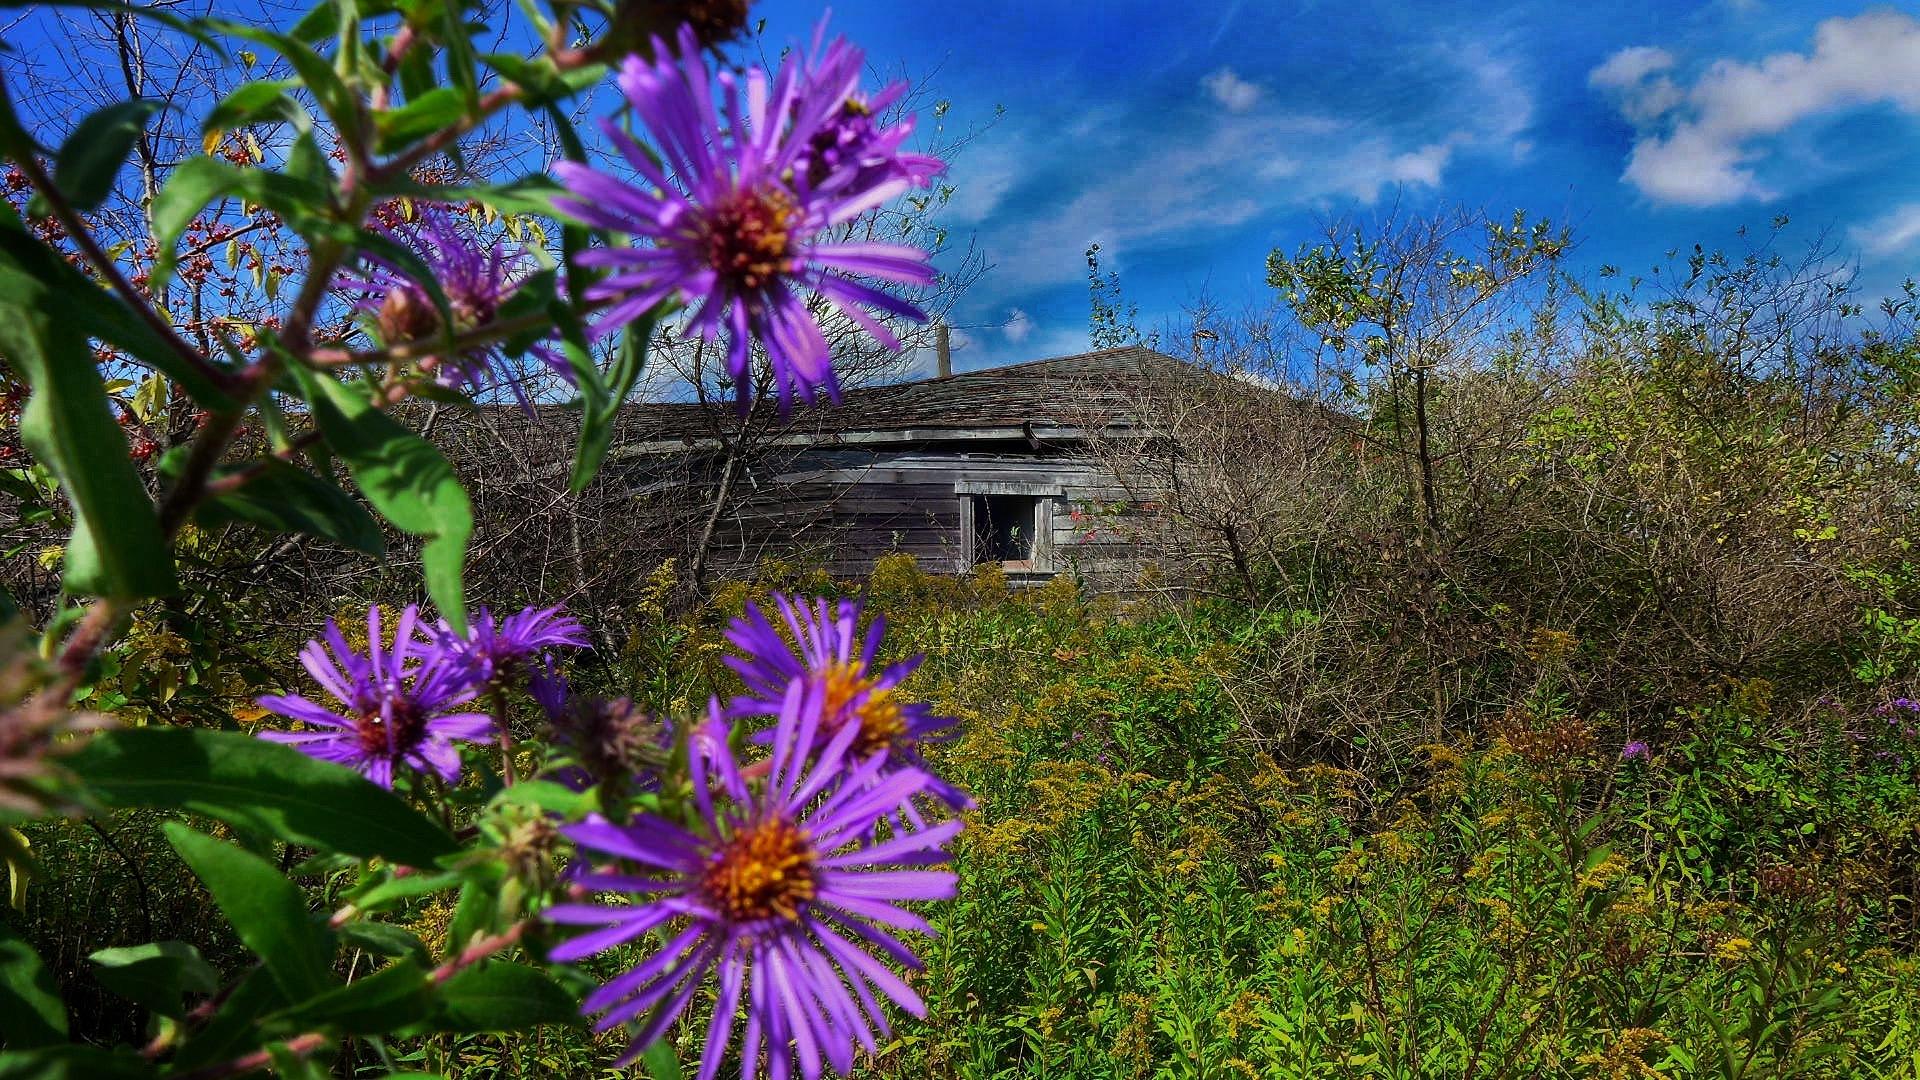 Abandoned Apple Farm by Walter Novak